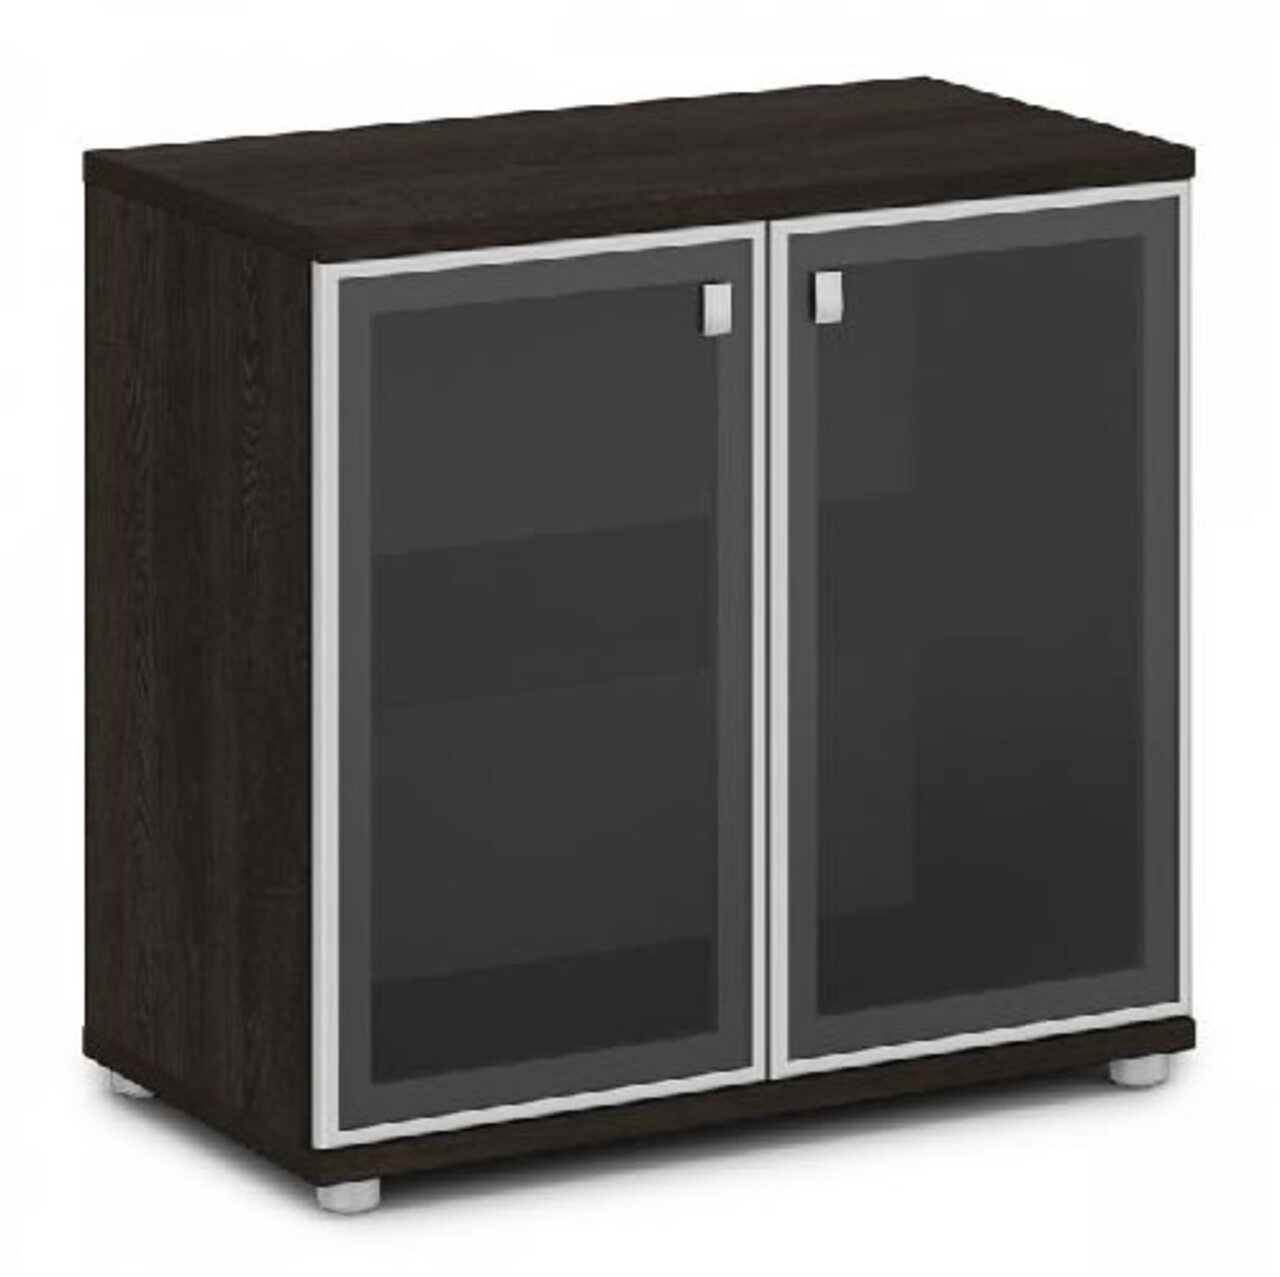 Шкаф со стеклом в алюминиевом профиле  Vasanta 82x44x79 - фото 1